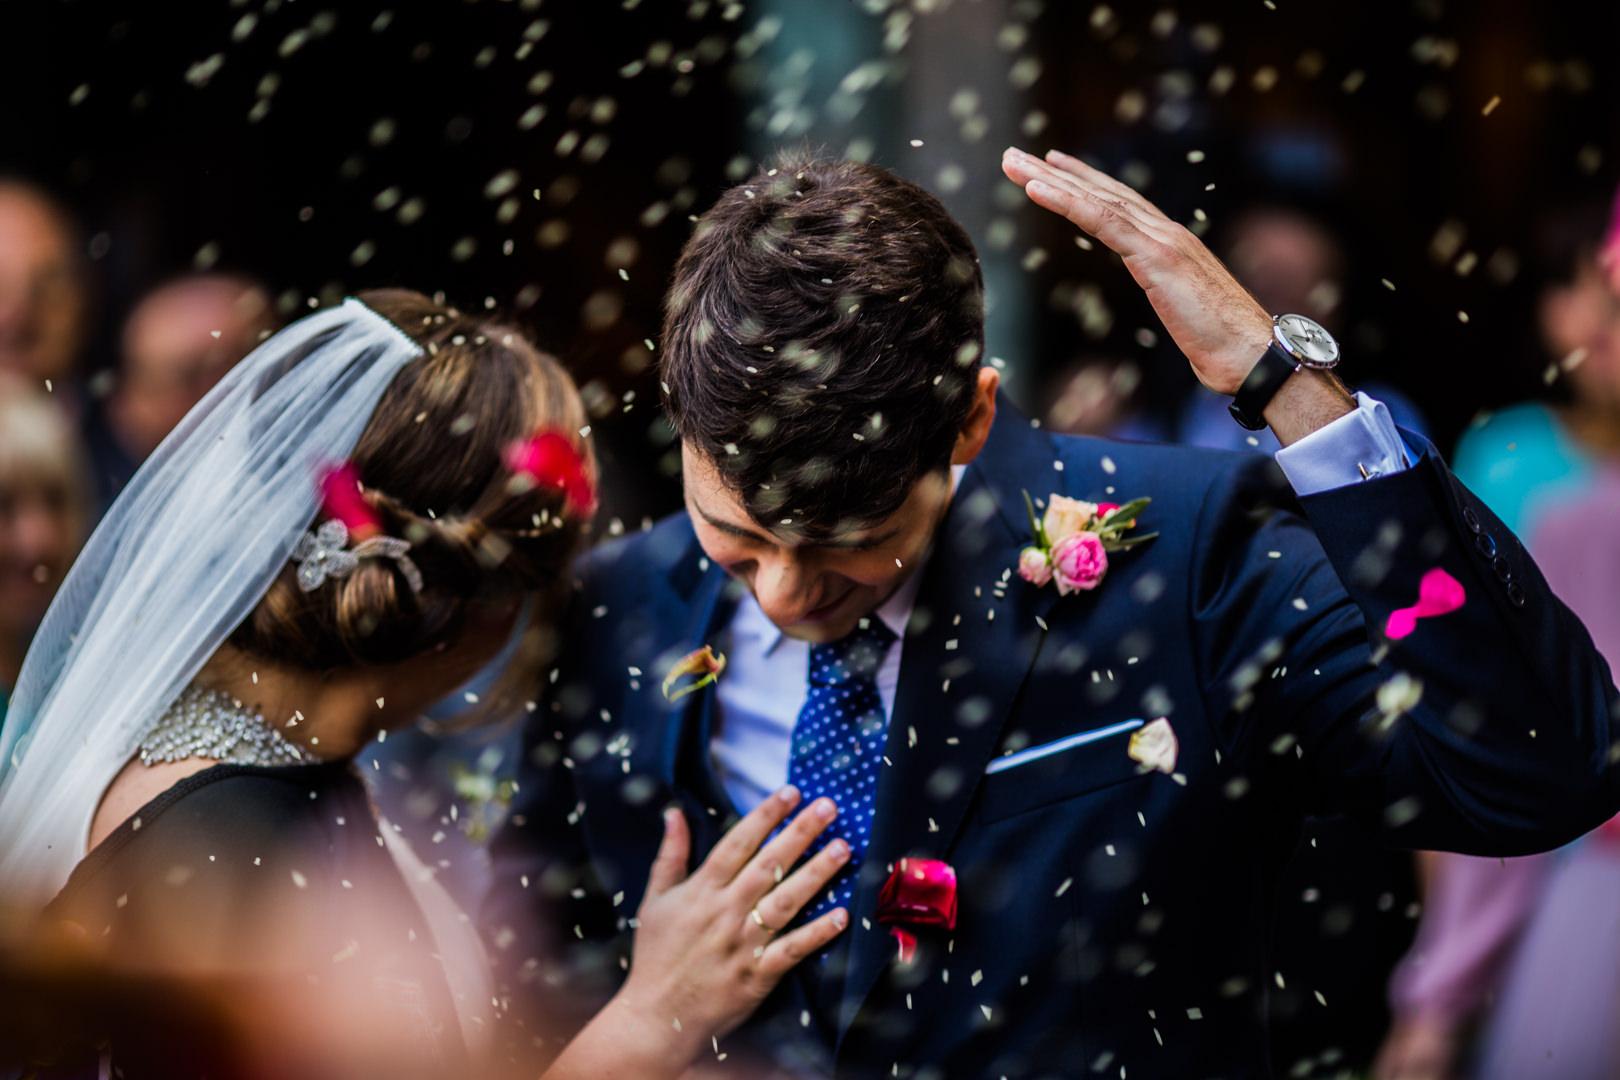 Boda-Catedral-Jaen-Hamburgo-Maria-David-engagement-Rafael-Torres-fotografo-bodas-sevilla-madrid-barcelona-wedding-photographer--28.jpg